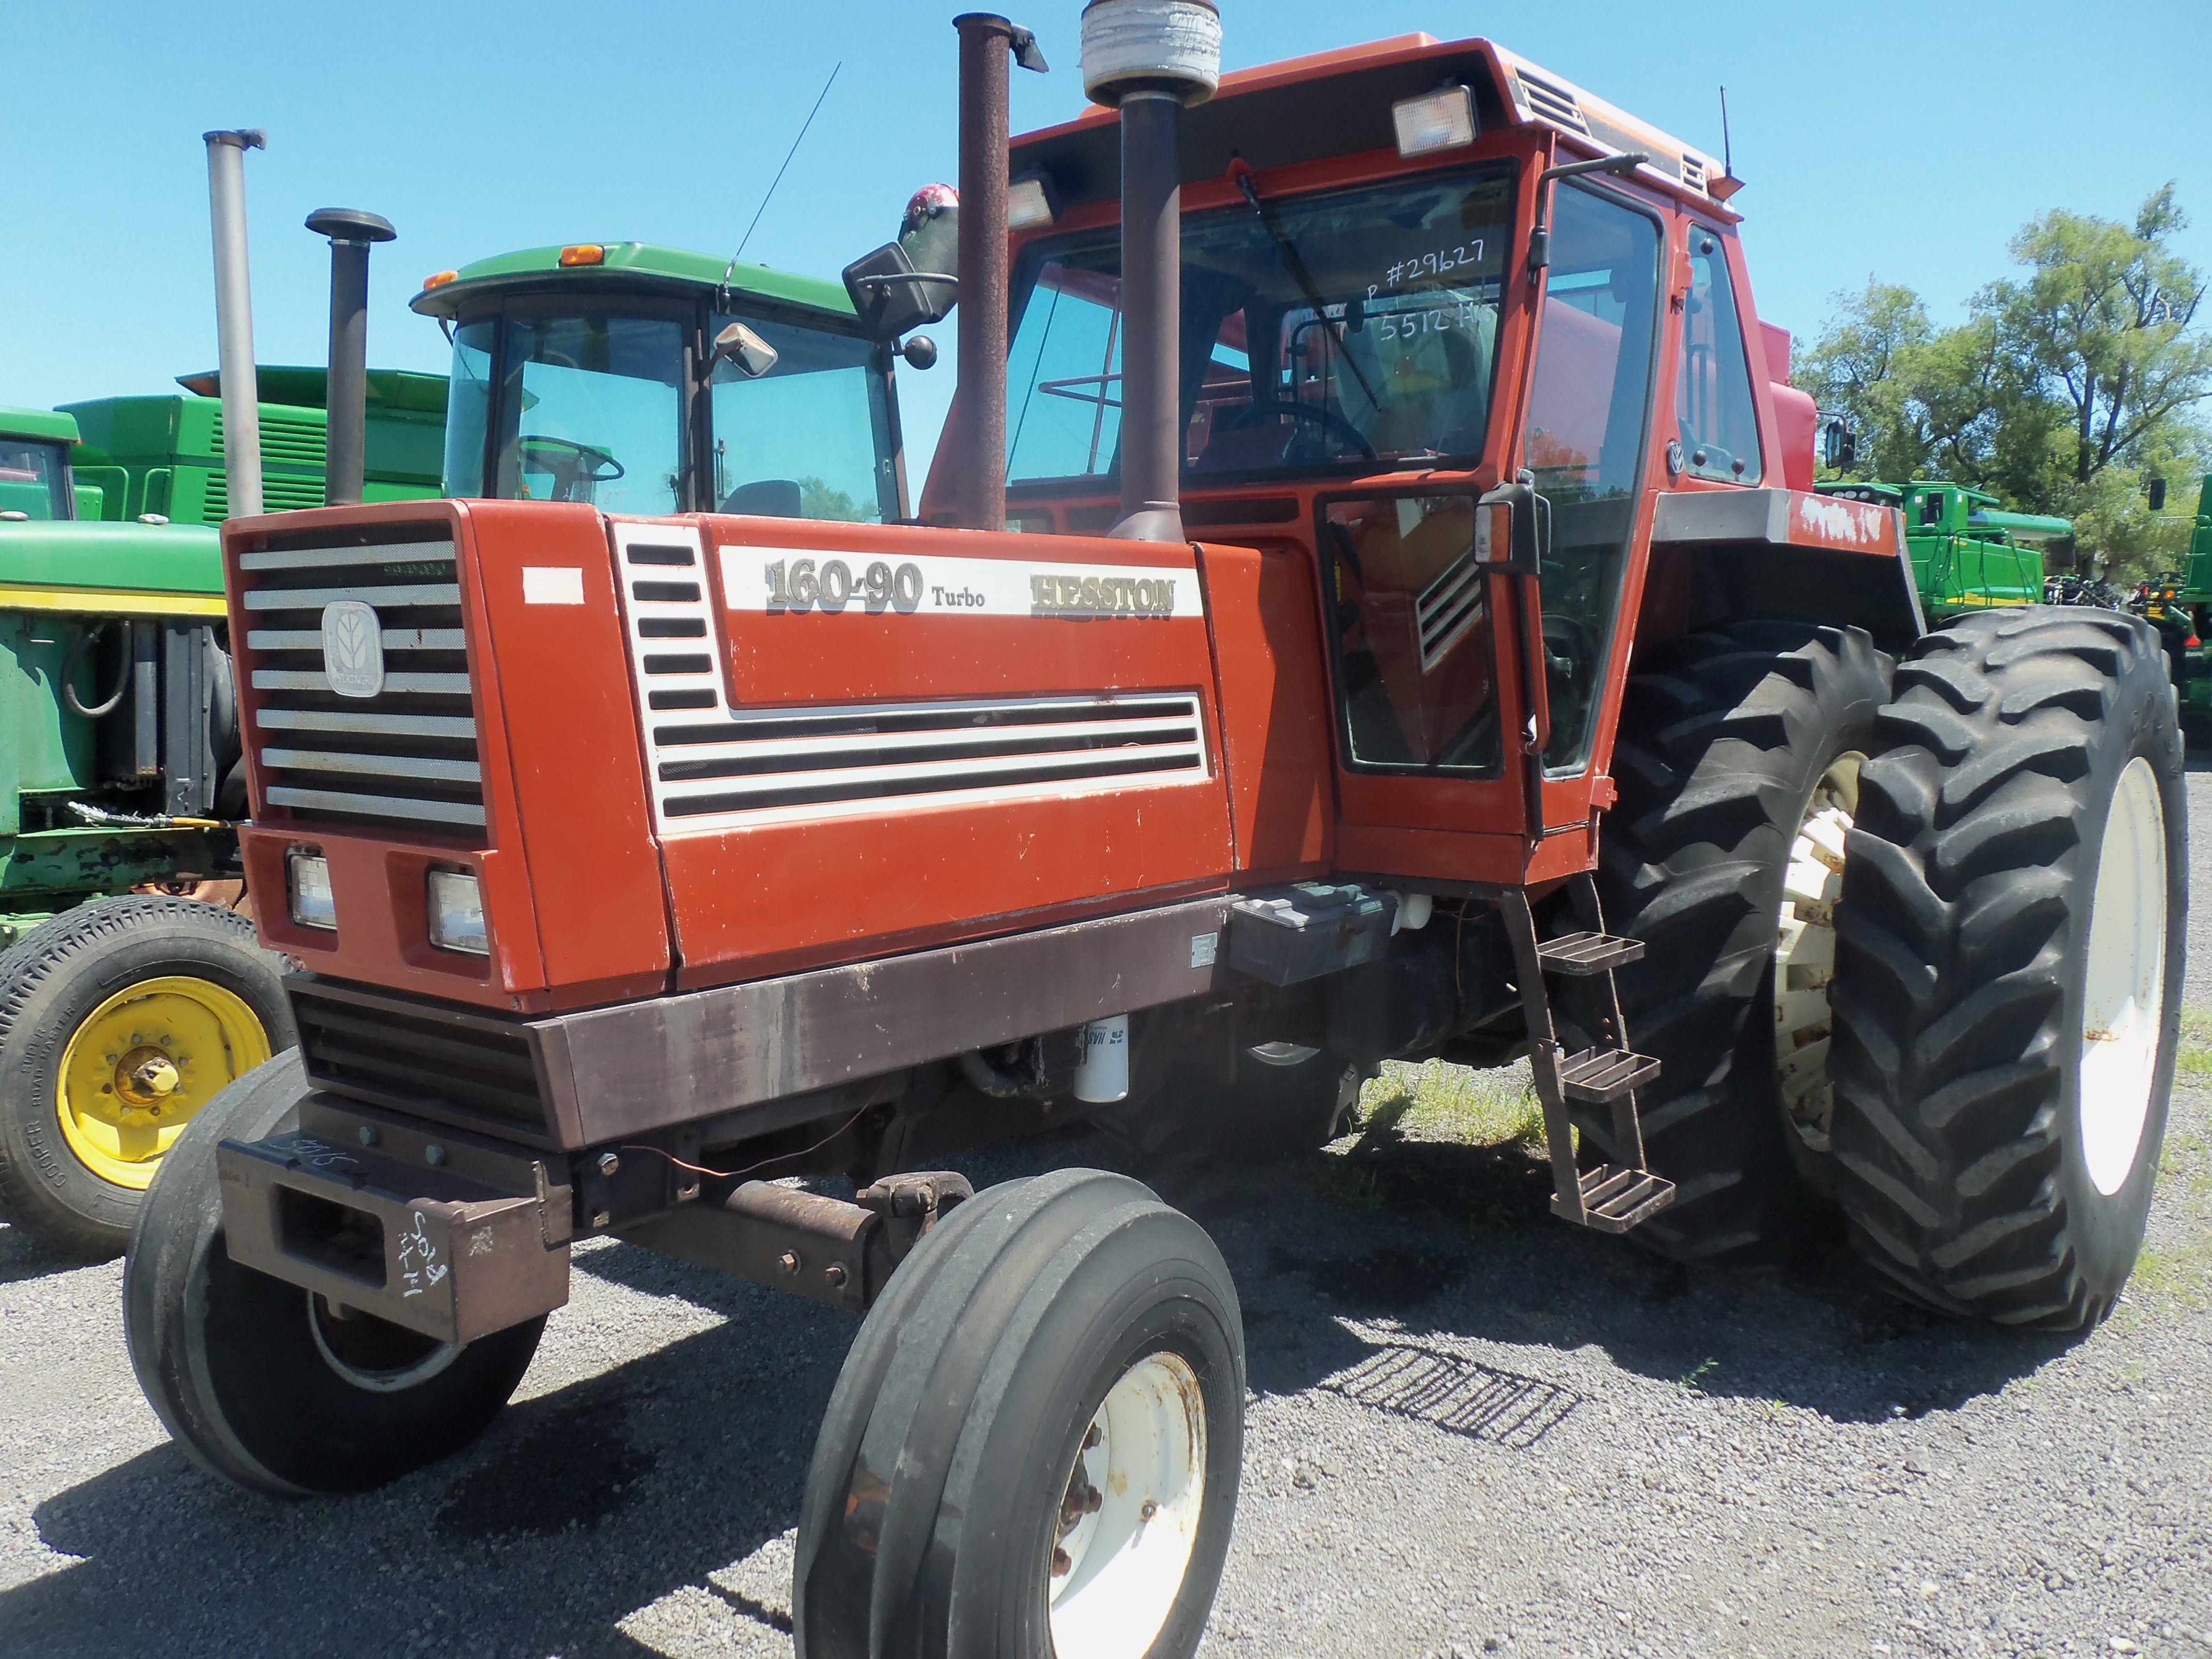 Fiat Hesston Tractors Farm : Hesston turbo tractor with duals tractors